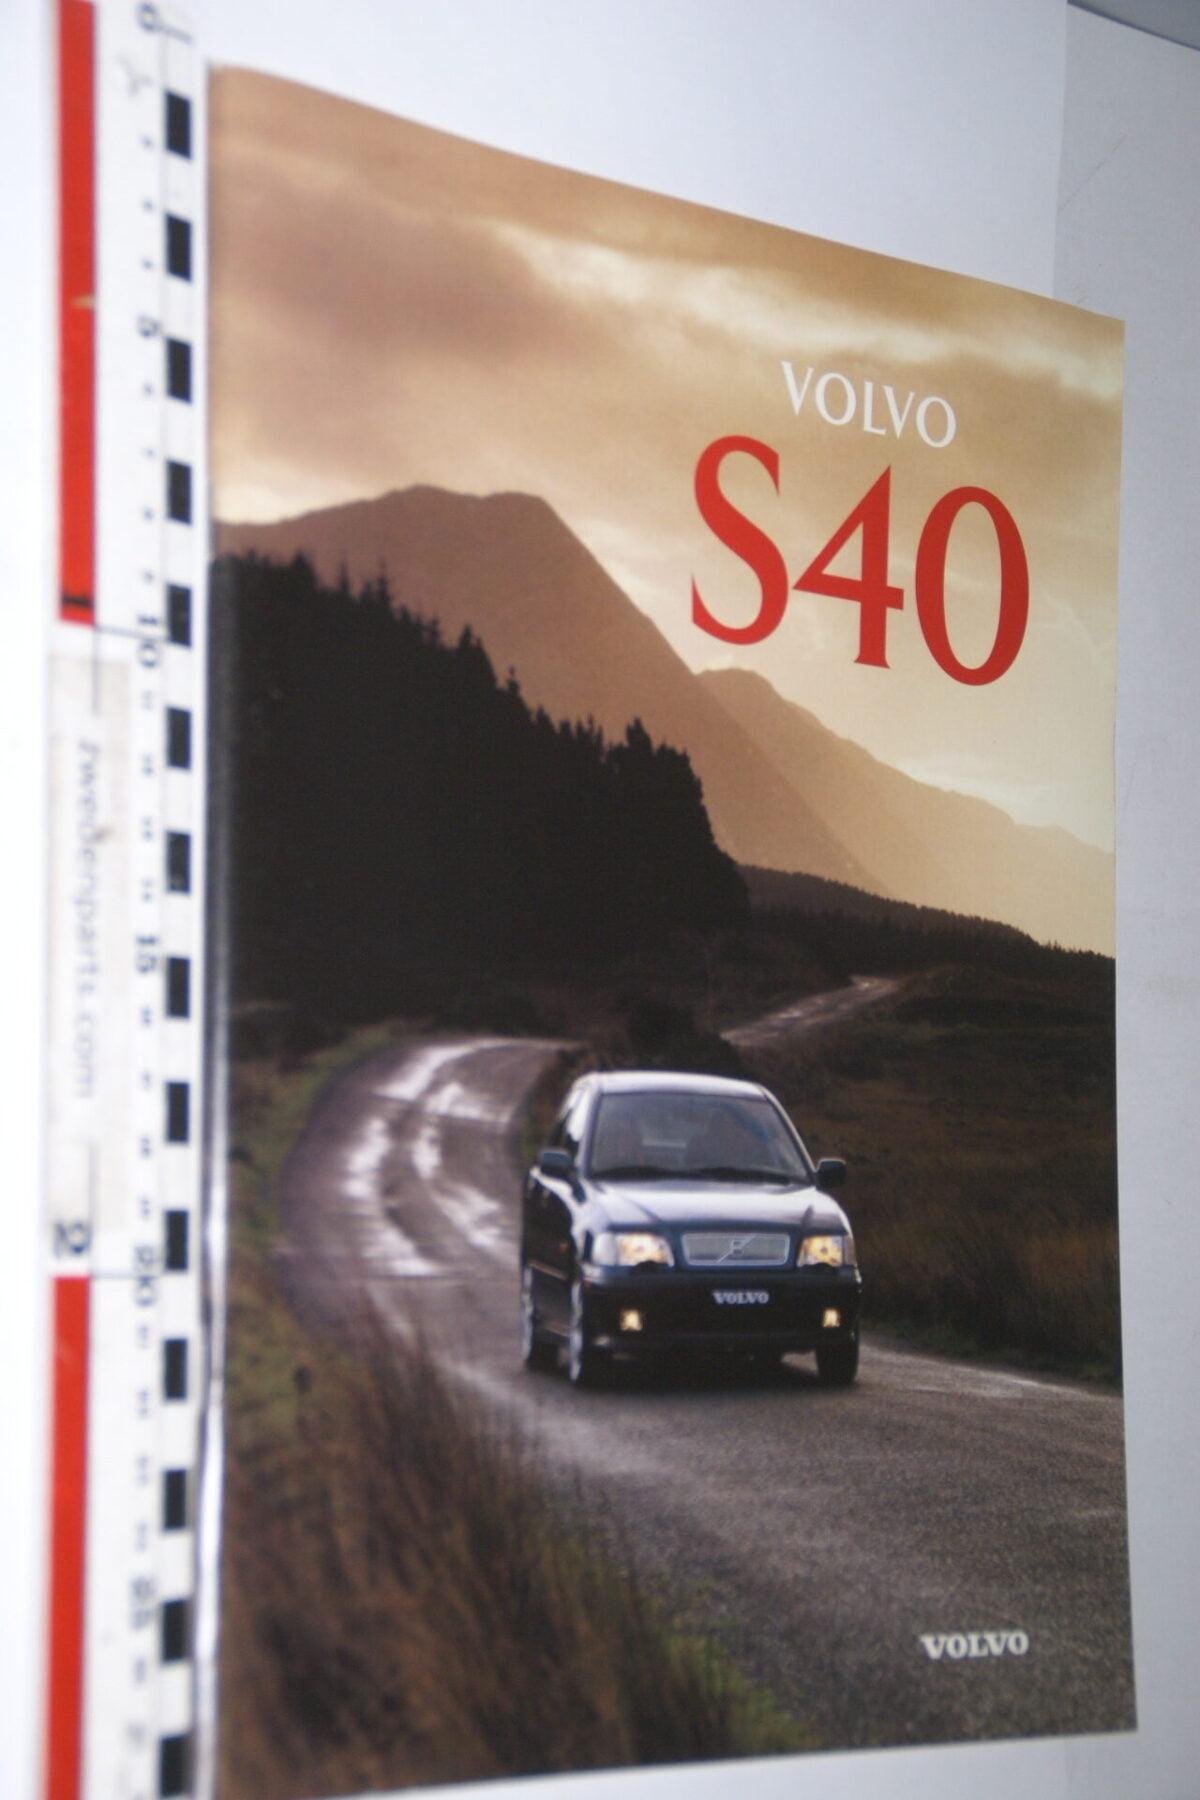 DSC04742 1996 originele brochure Volvo S40 nr MSPV 8050 Svenska-71d52d33